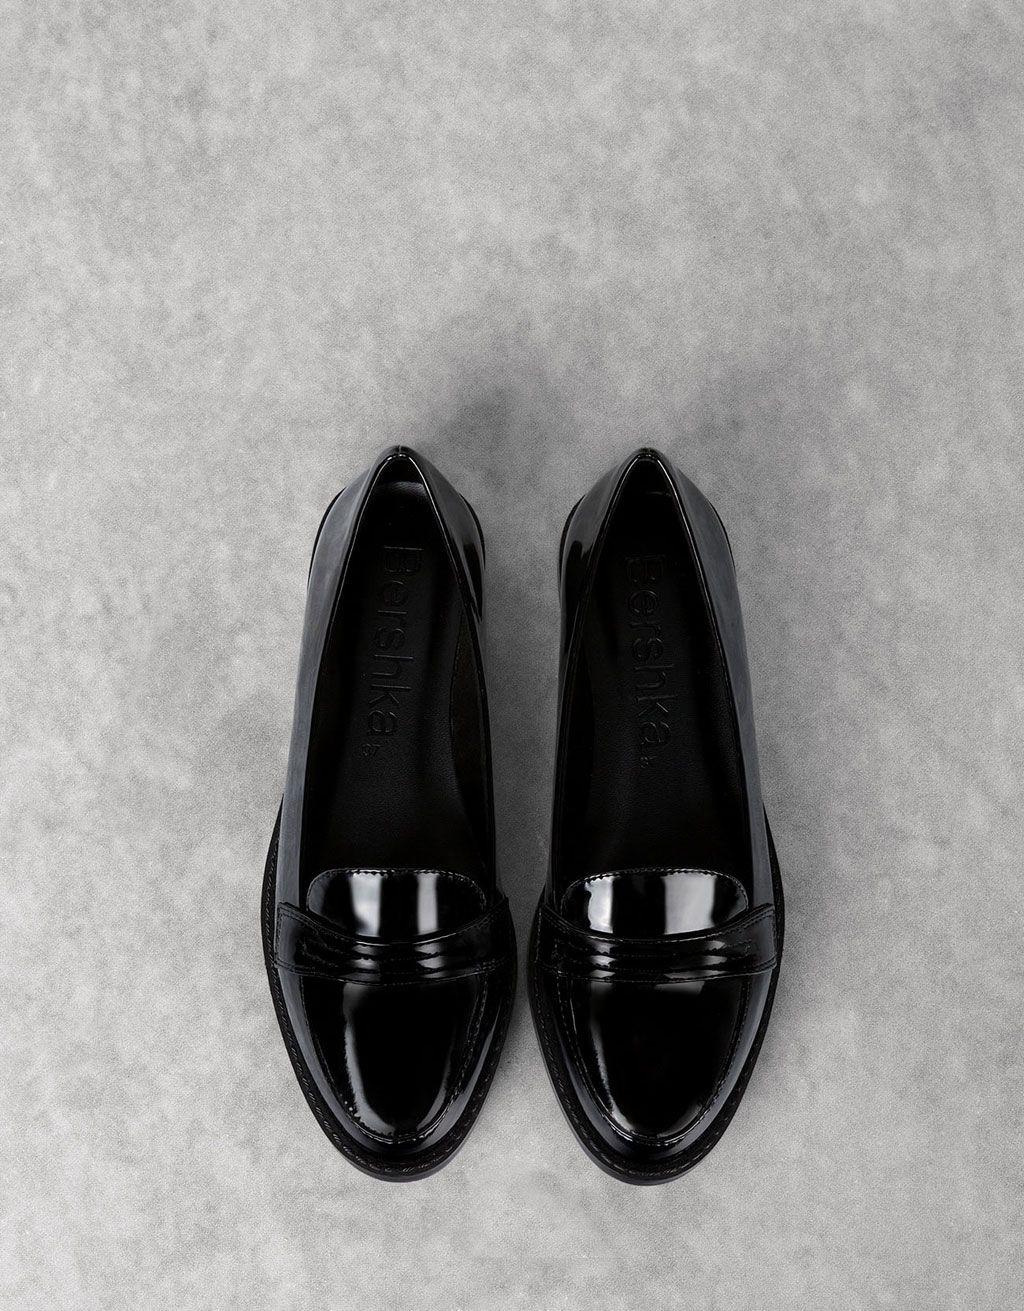 Nike Mujer Zapatos de charol | eBay